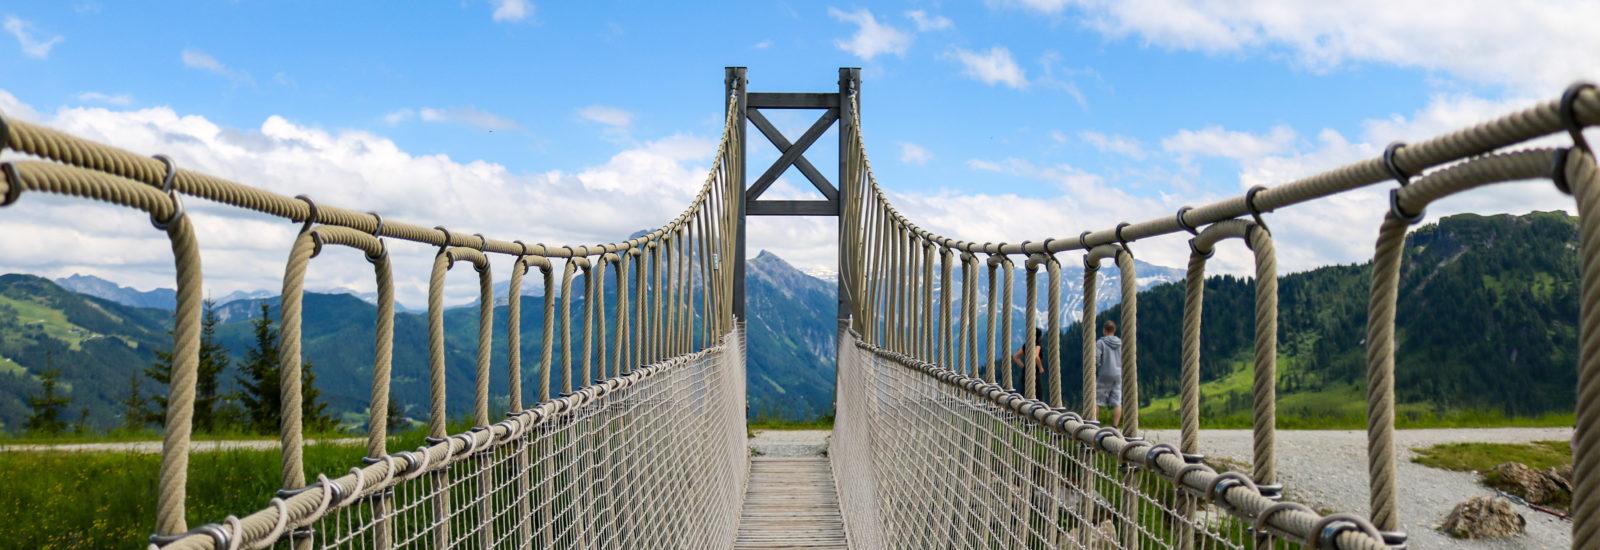 Wagrainis Grafenberg Hängebrücke